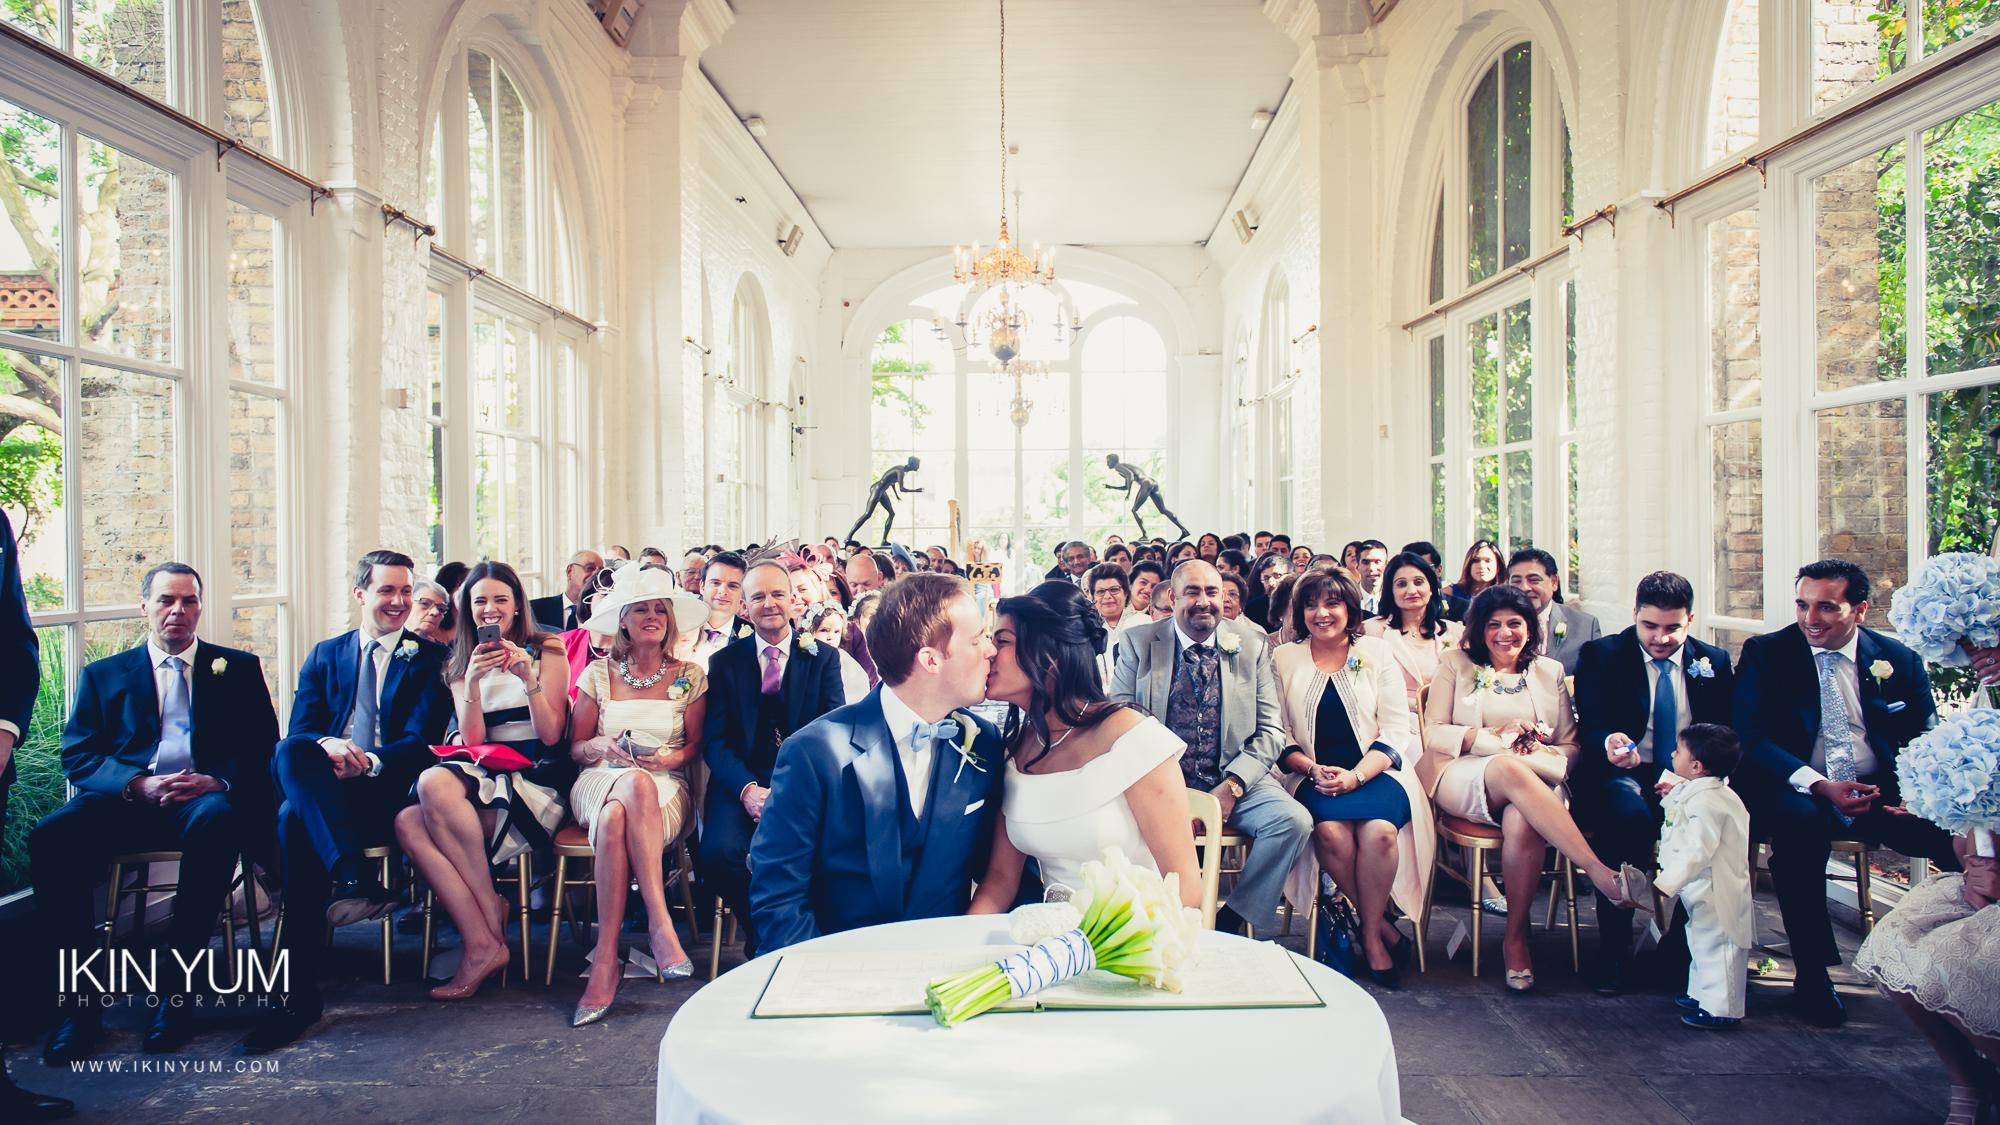 Holland Park Wedding - Ikin Yum Photography-0043.jpg